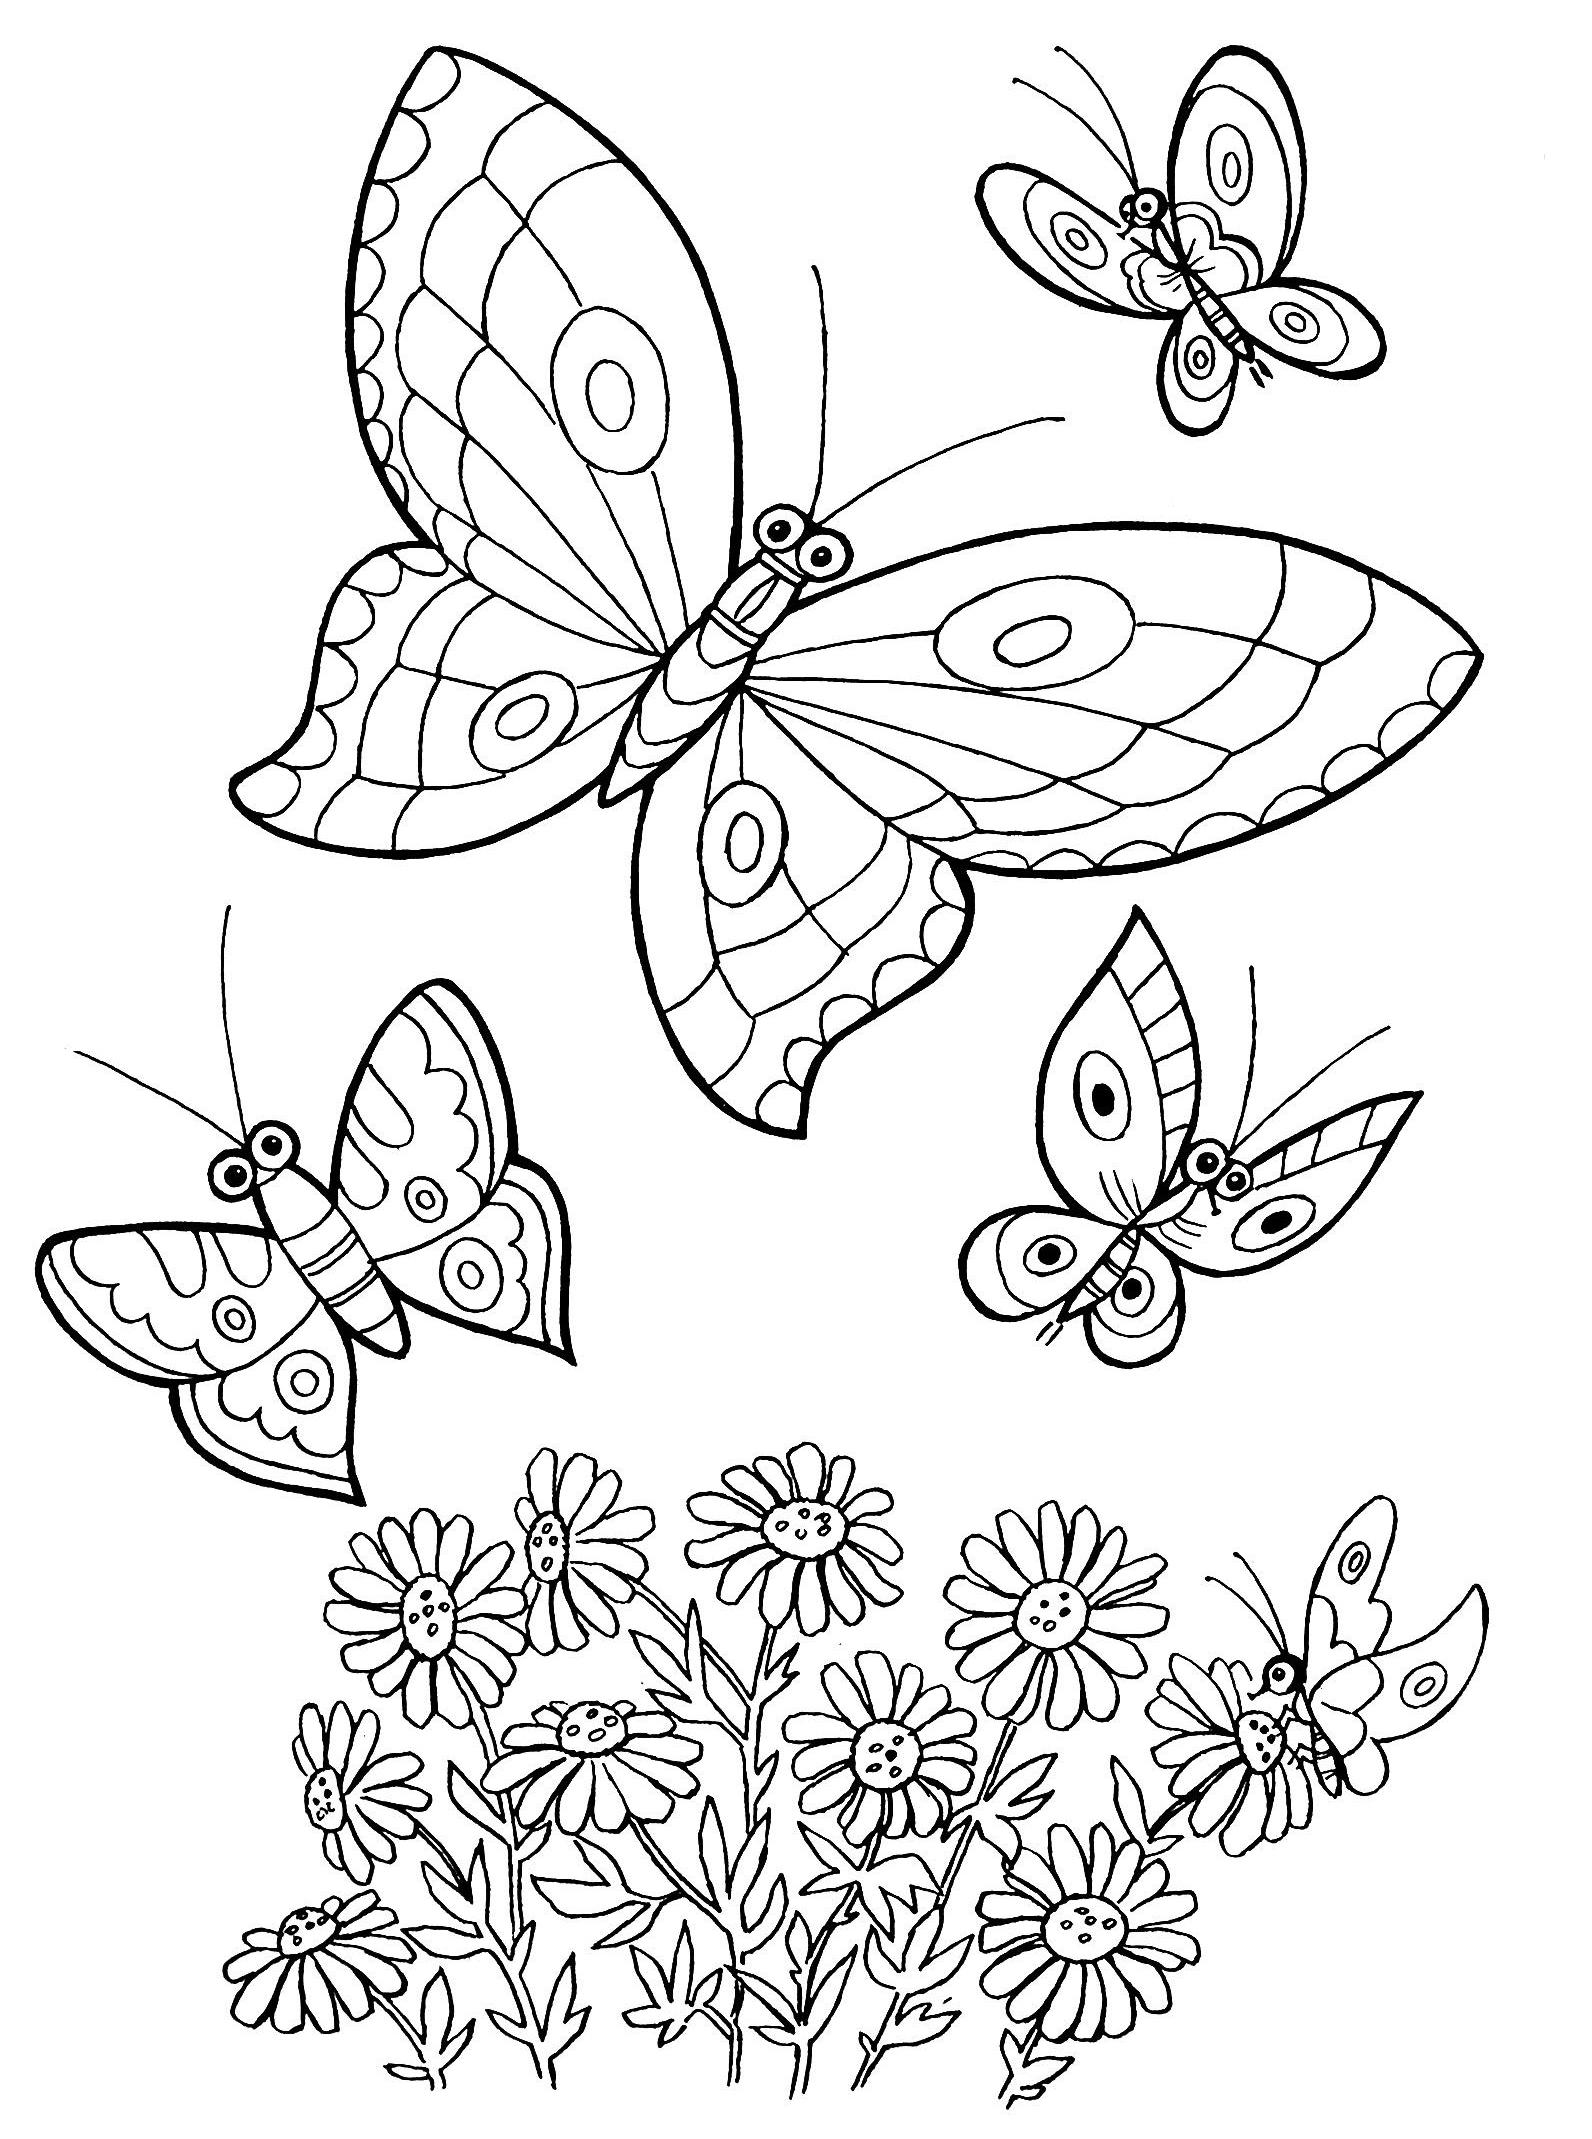 Раскраски бабочки на цветах